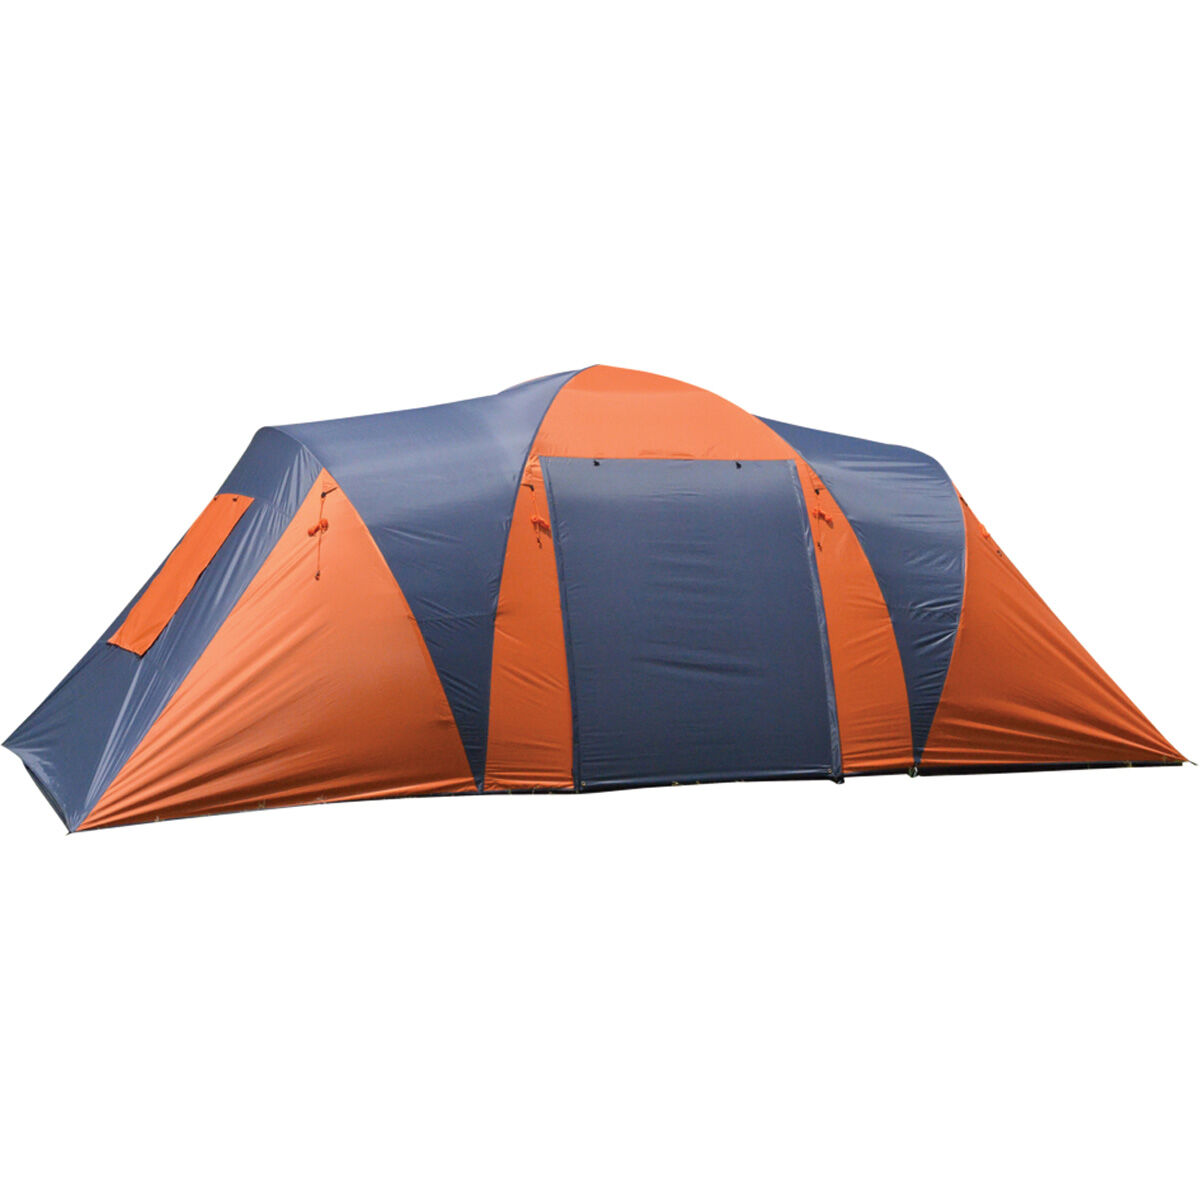 ... Wanderer Larapinta Dome Tent 10 Person  bcf_hi-res  sc 1 st  BCF Australia & Dome Tents - Buy Online - BCF Australia